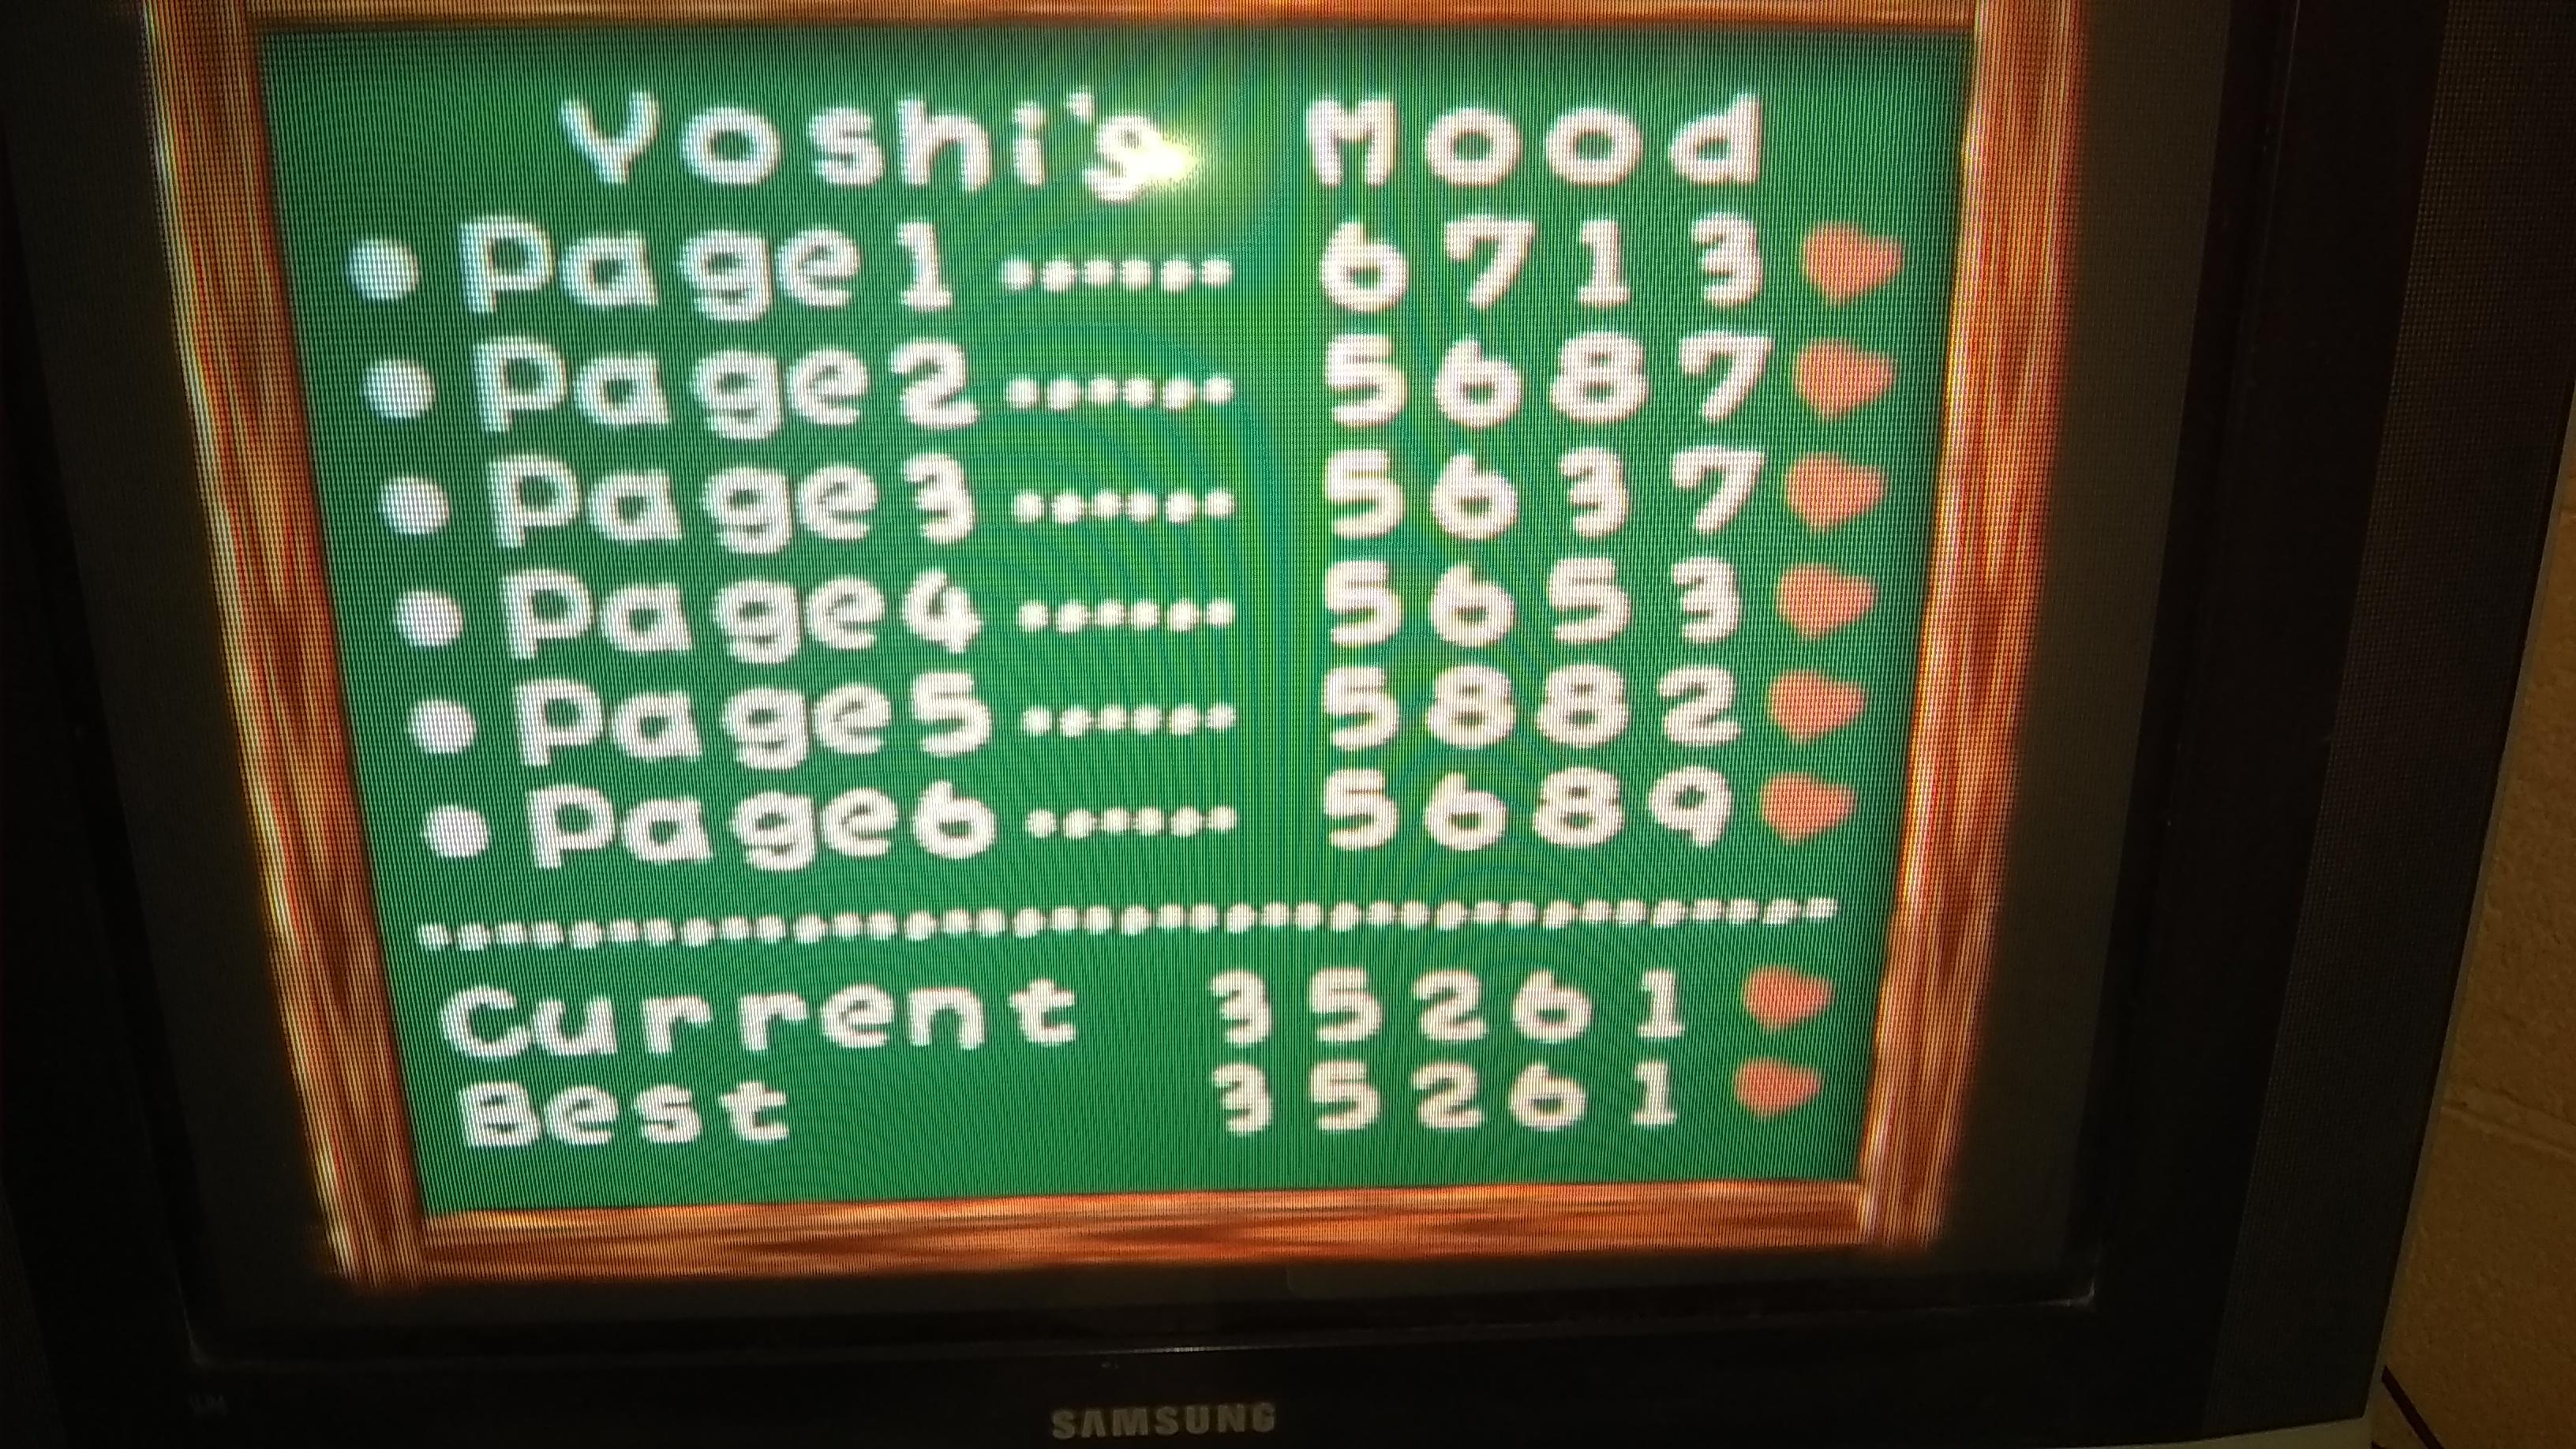 yourgamerman: Yoshi